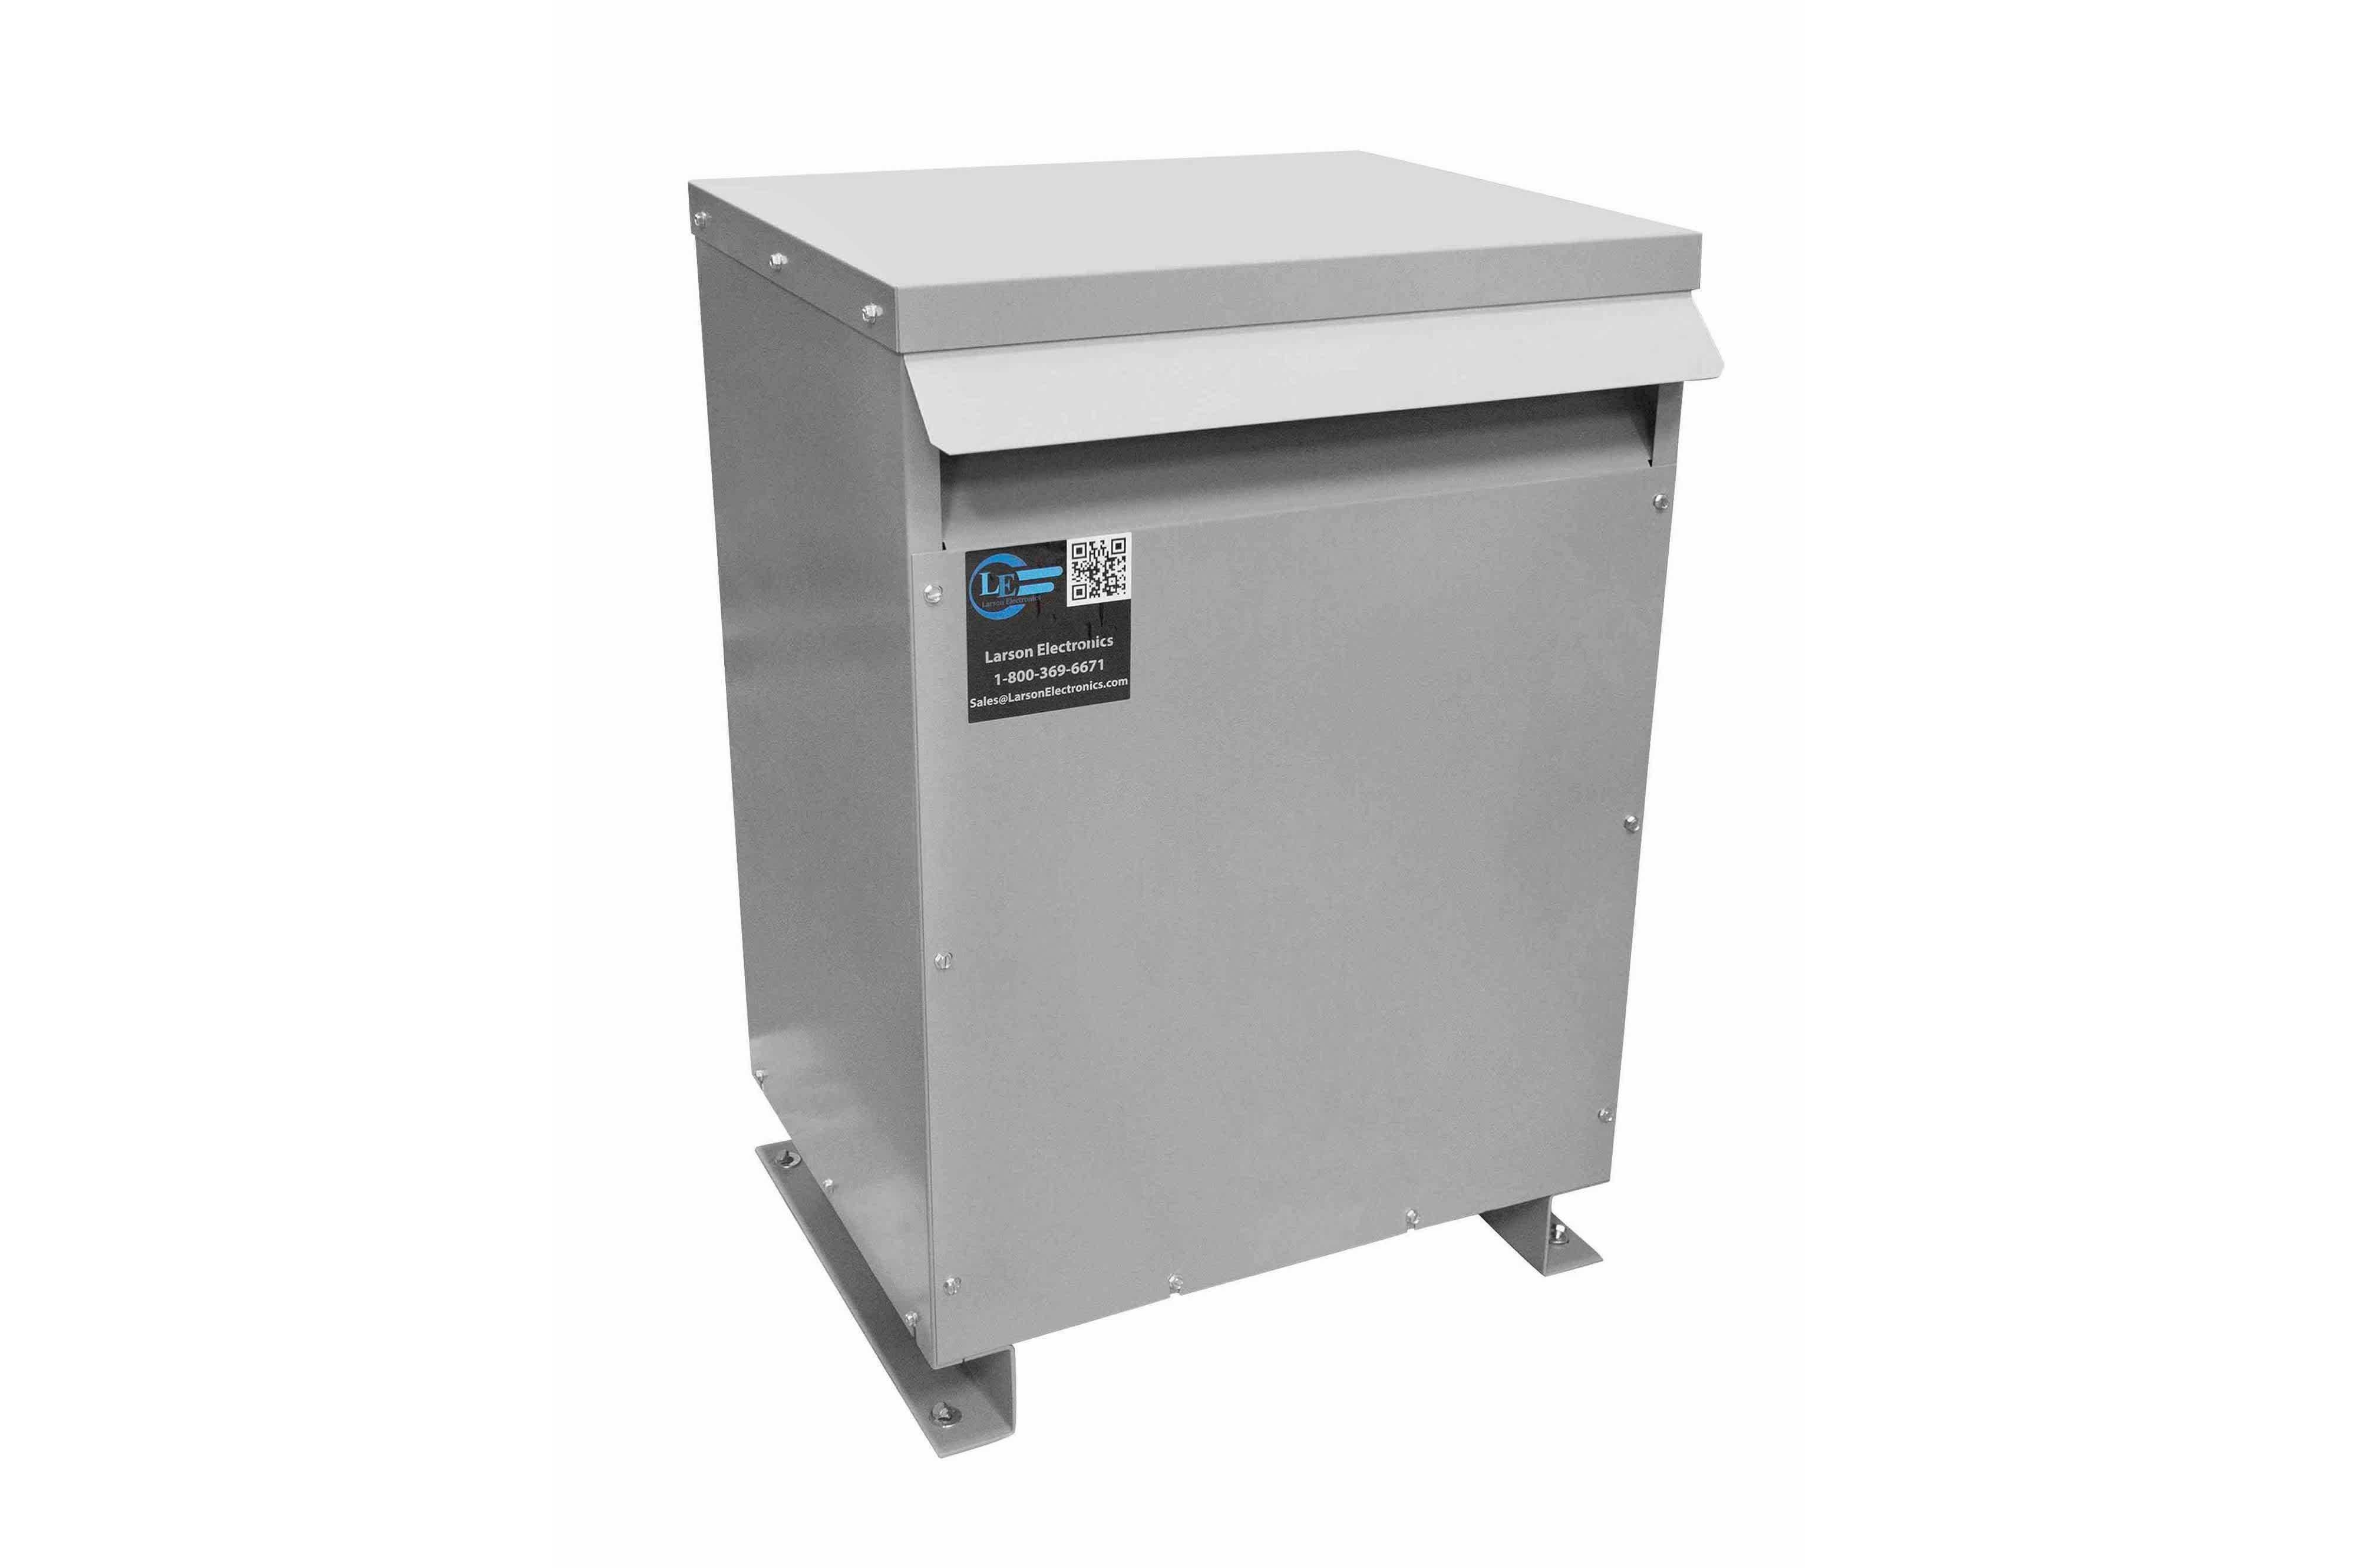 900 kVA 3PH Isolation Transformer, 460V Wye Primary, 208Y/120 Wye-N Secondary, N3R, Ventilated, 60 Hz